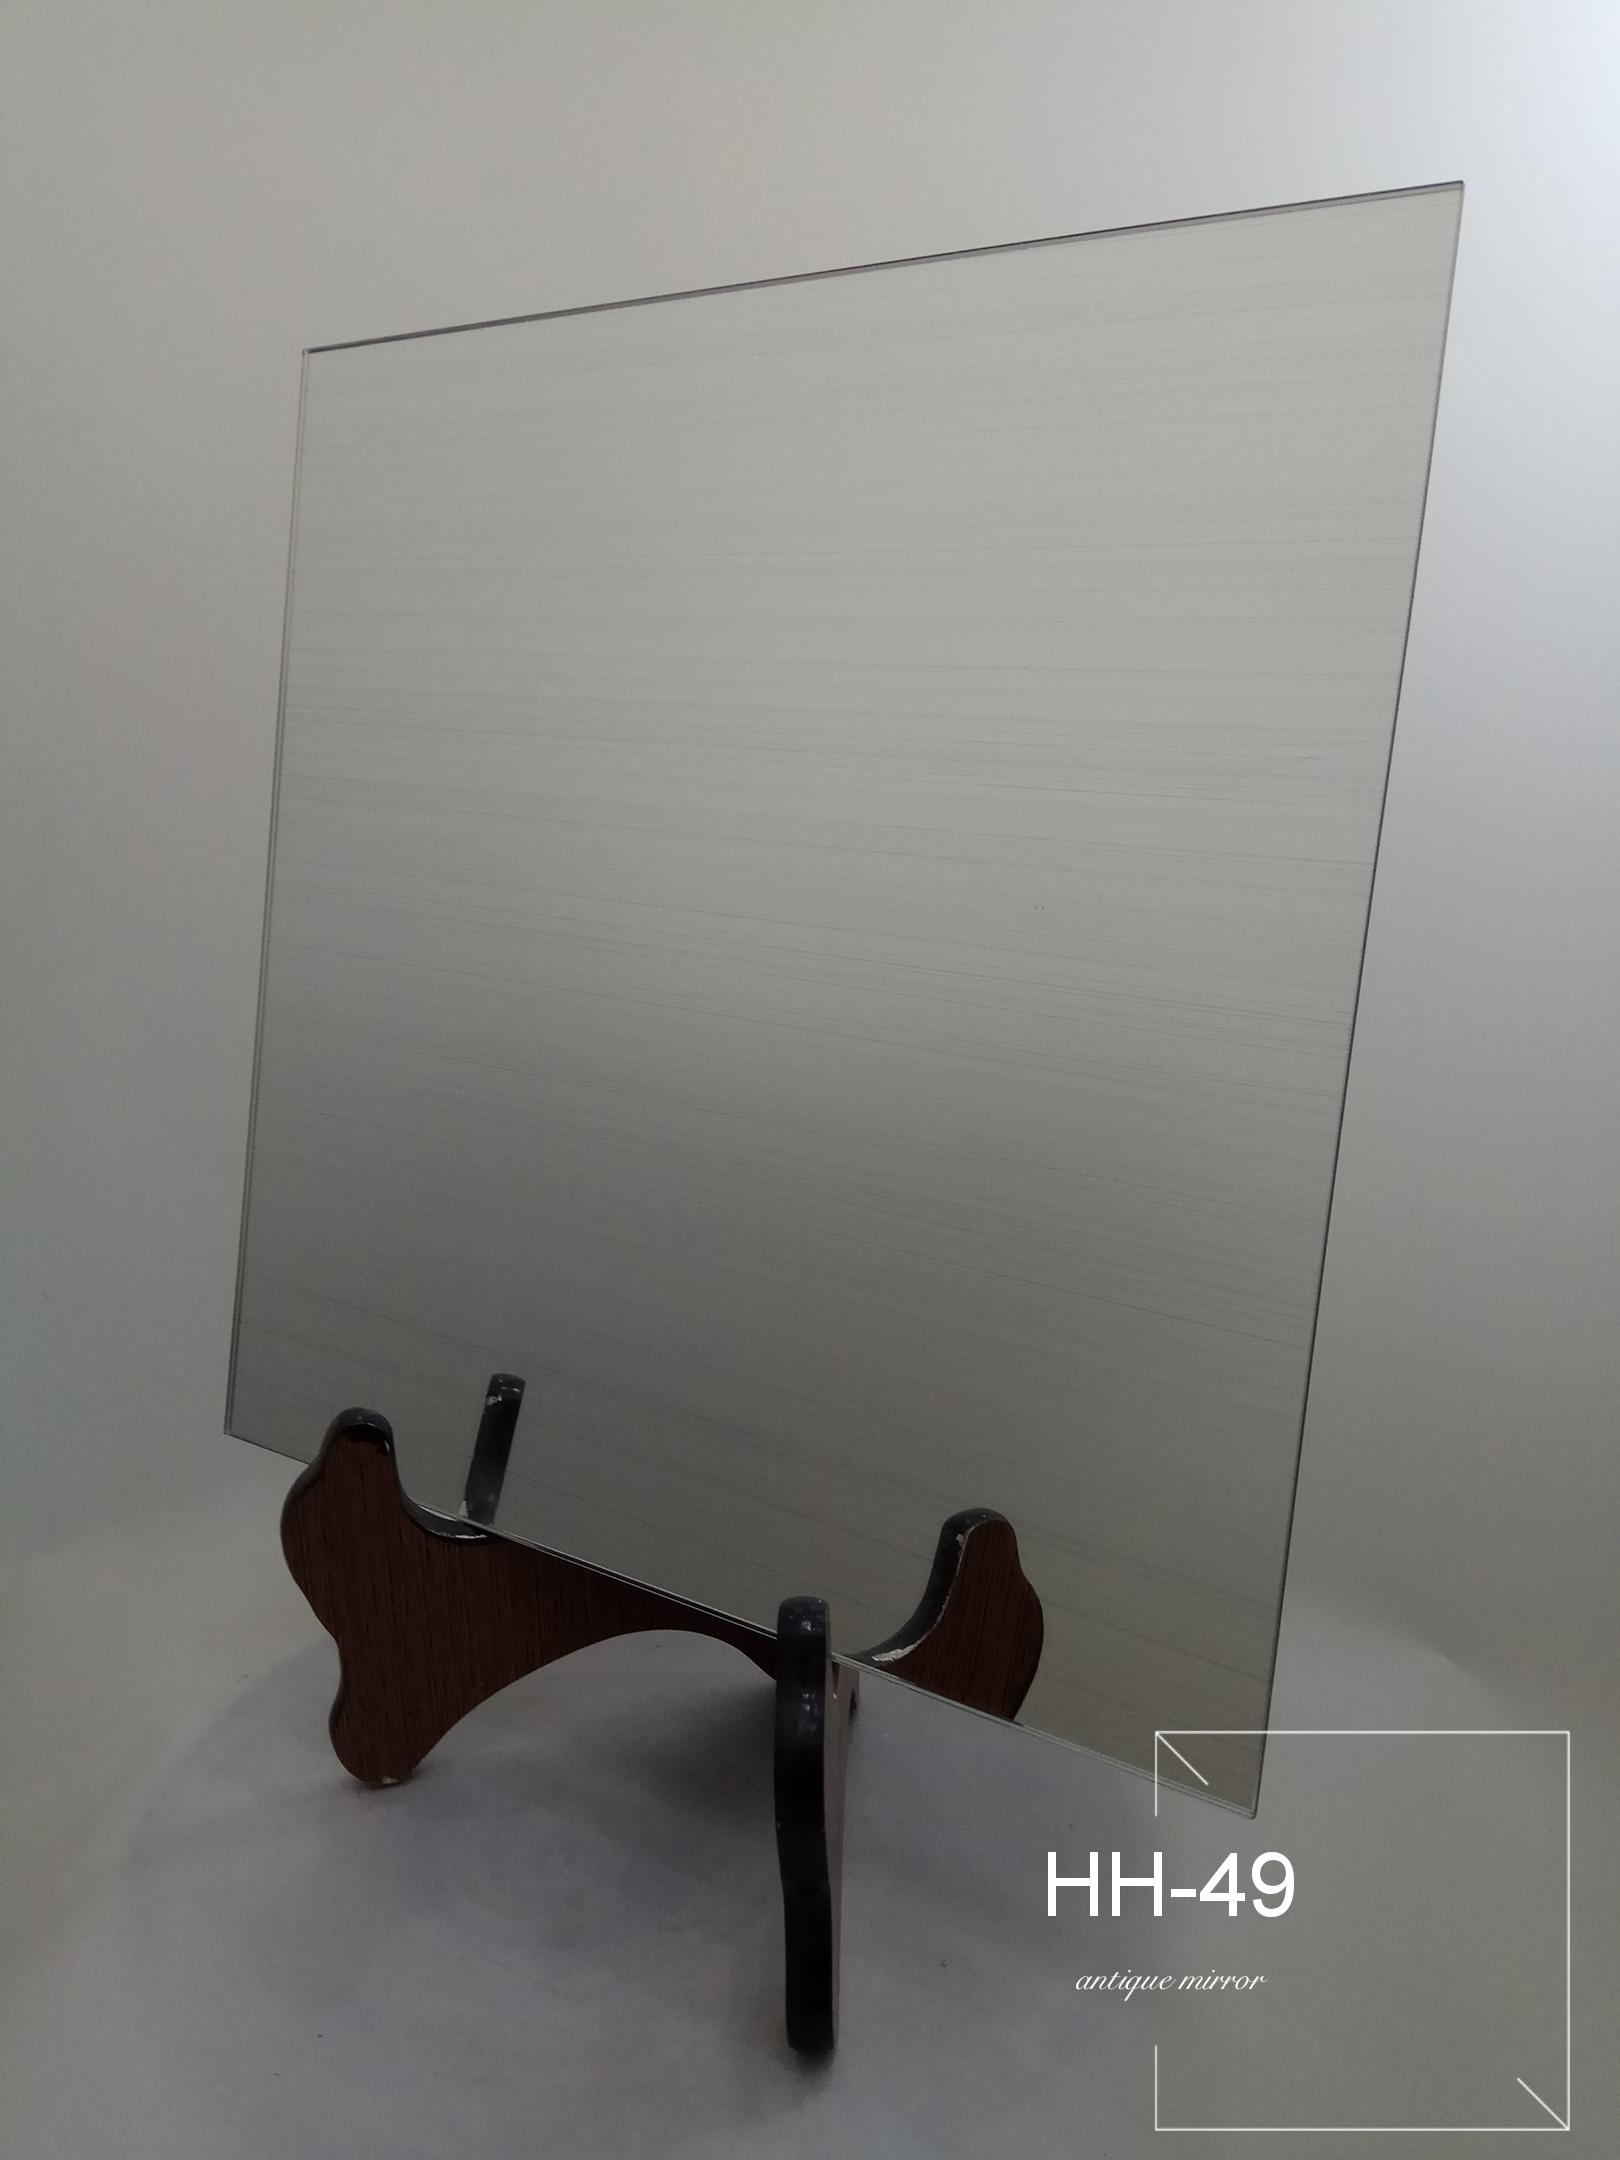 HH-49 Antique Mirror/ Decorative Mirror